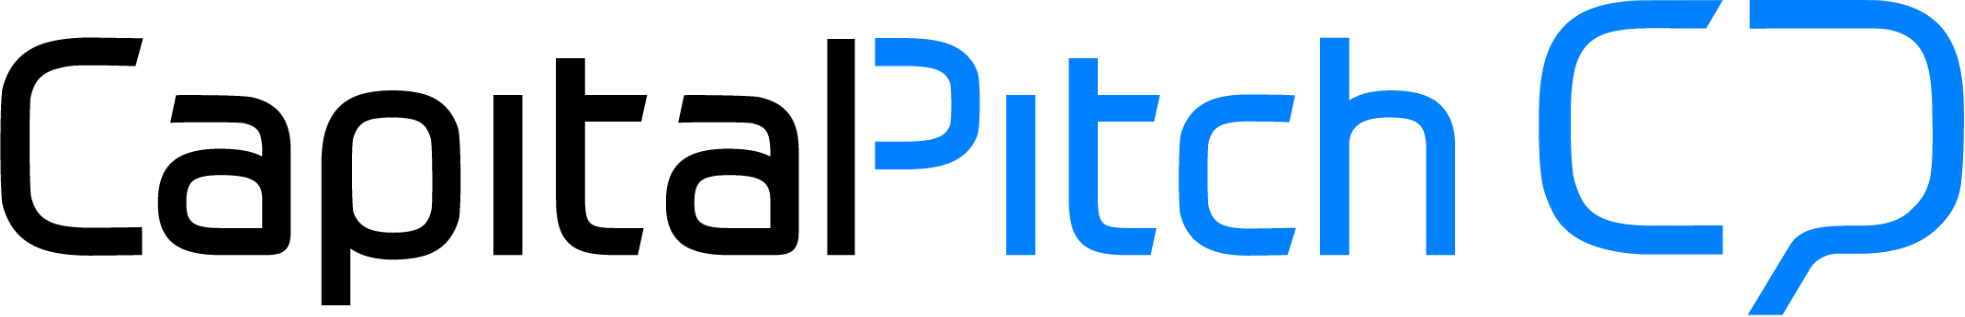 CapitalPitch-logo-dark.png